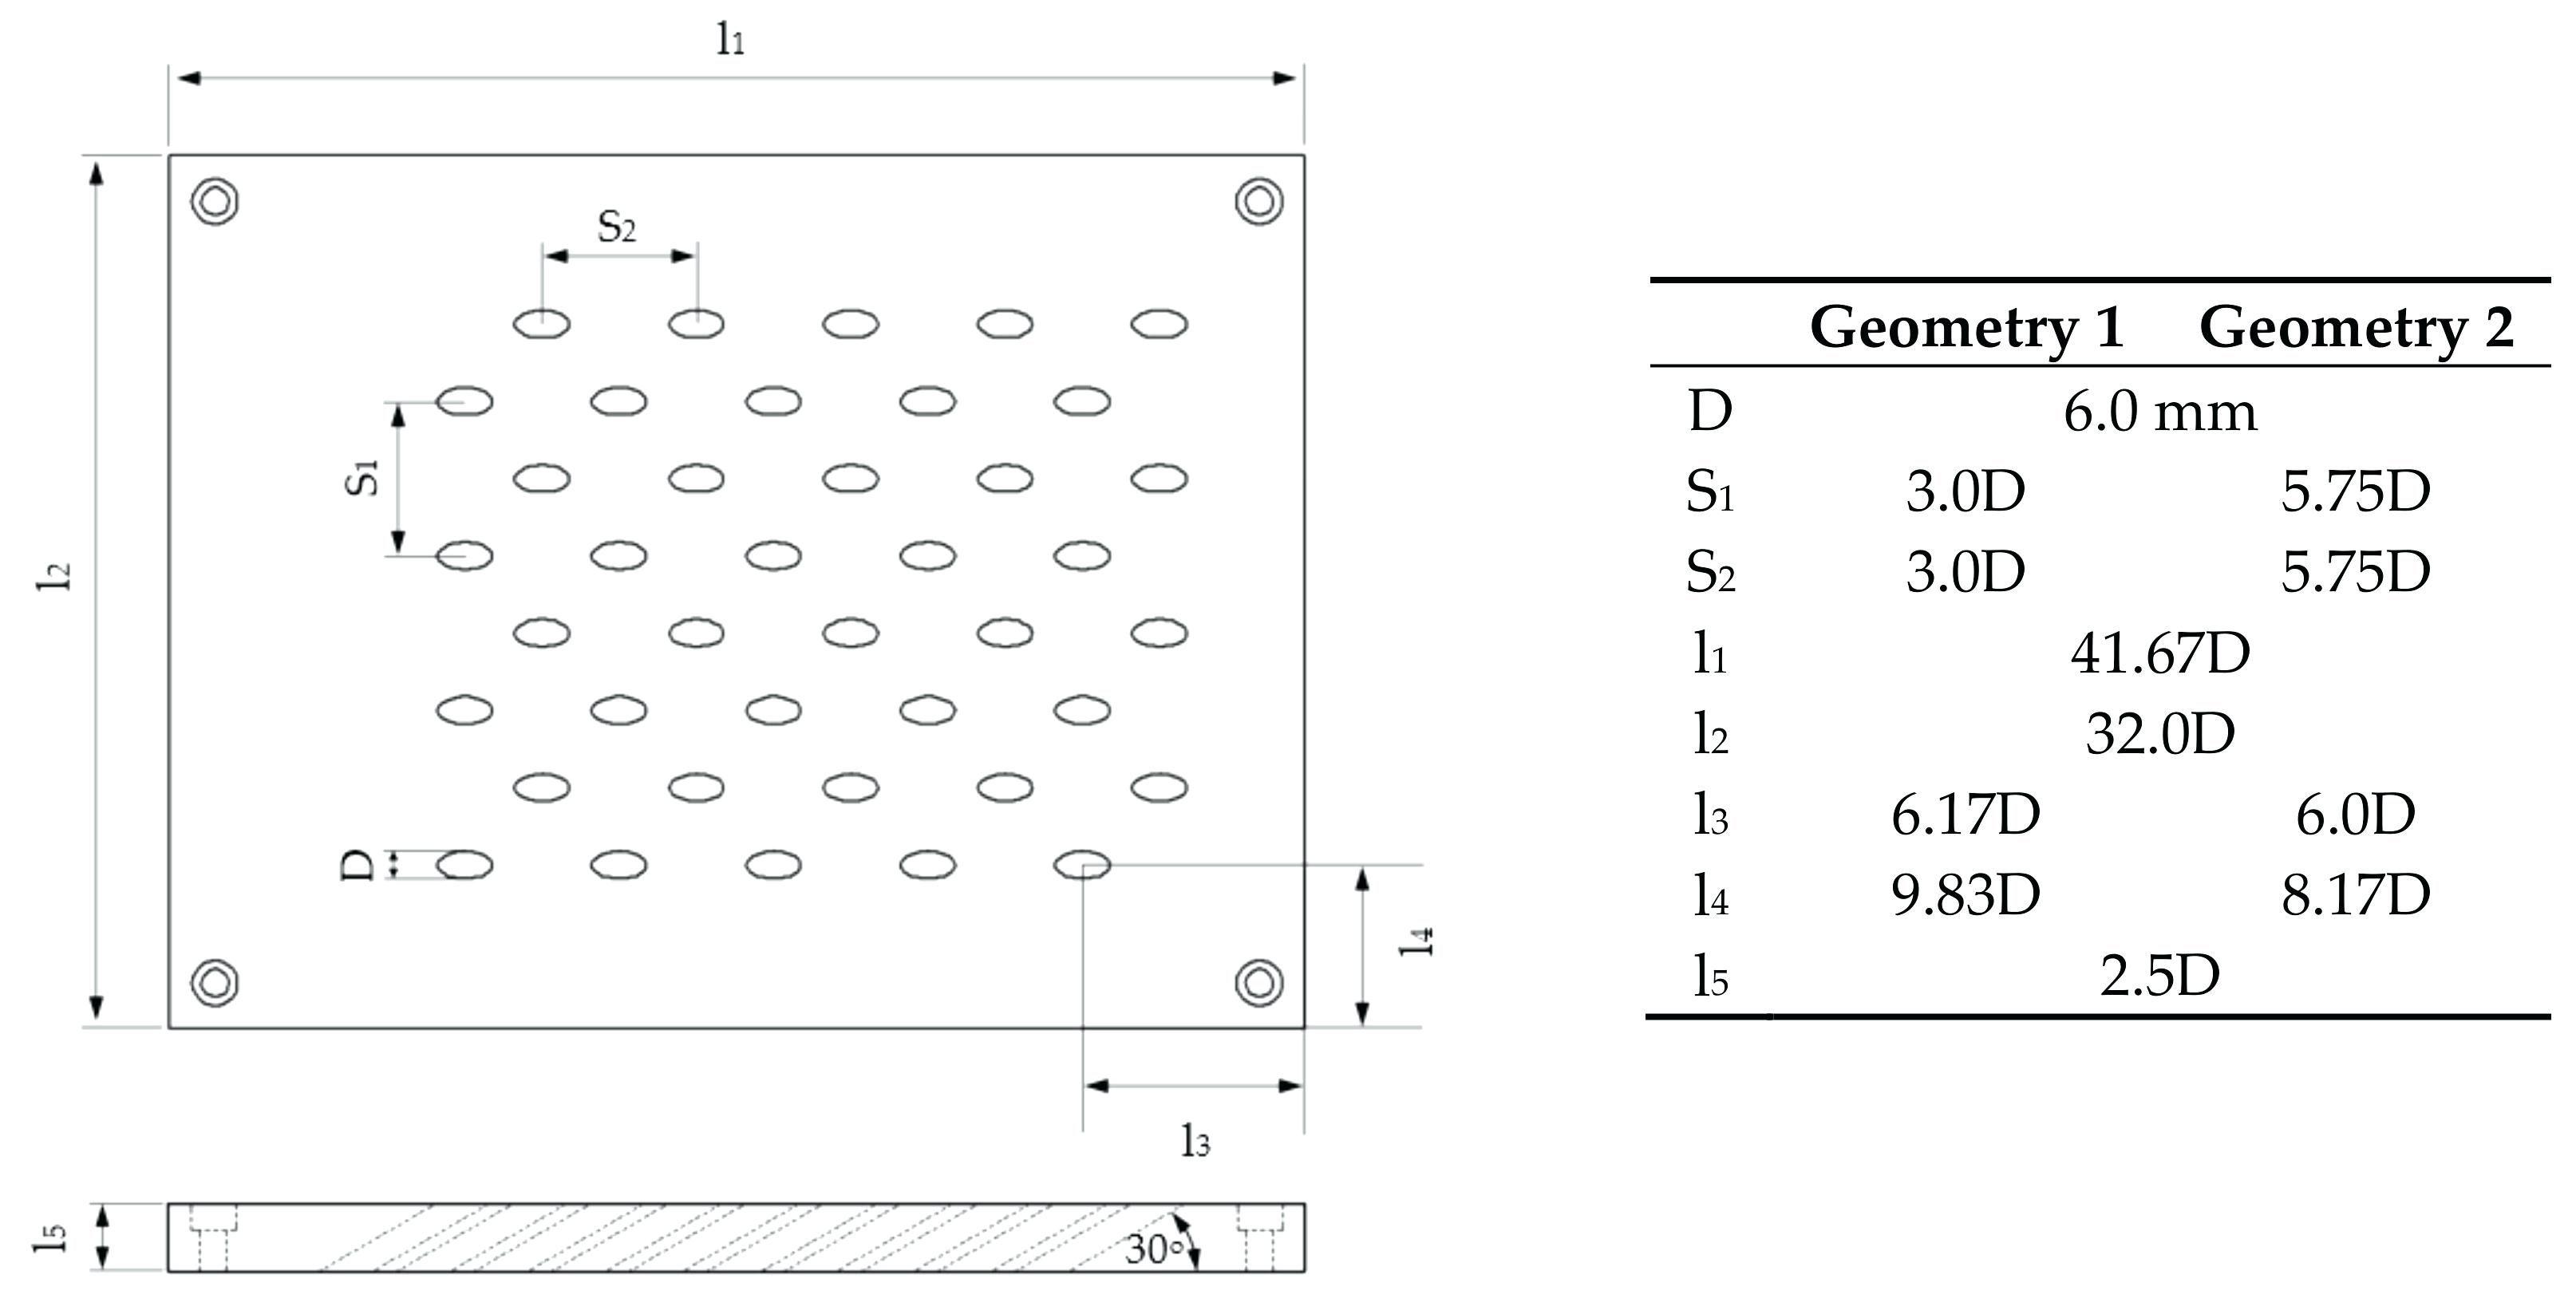 41 Stunning 6th Grade Math Worksheets Design